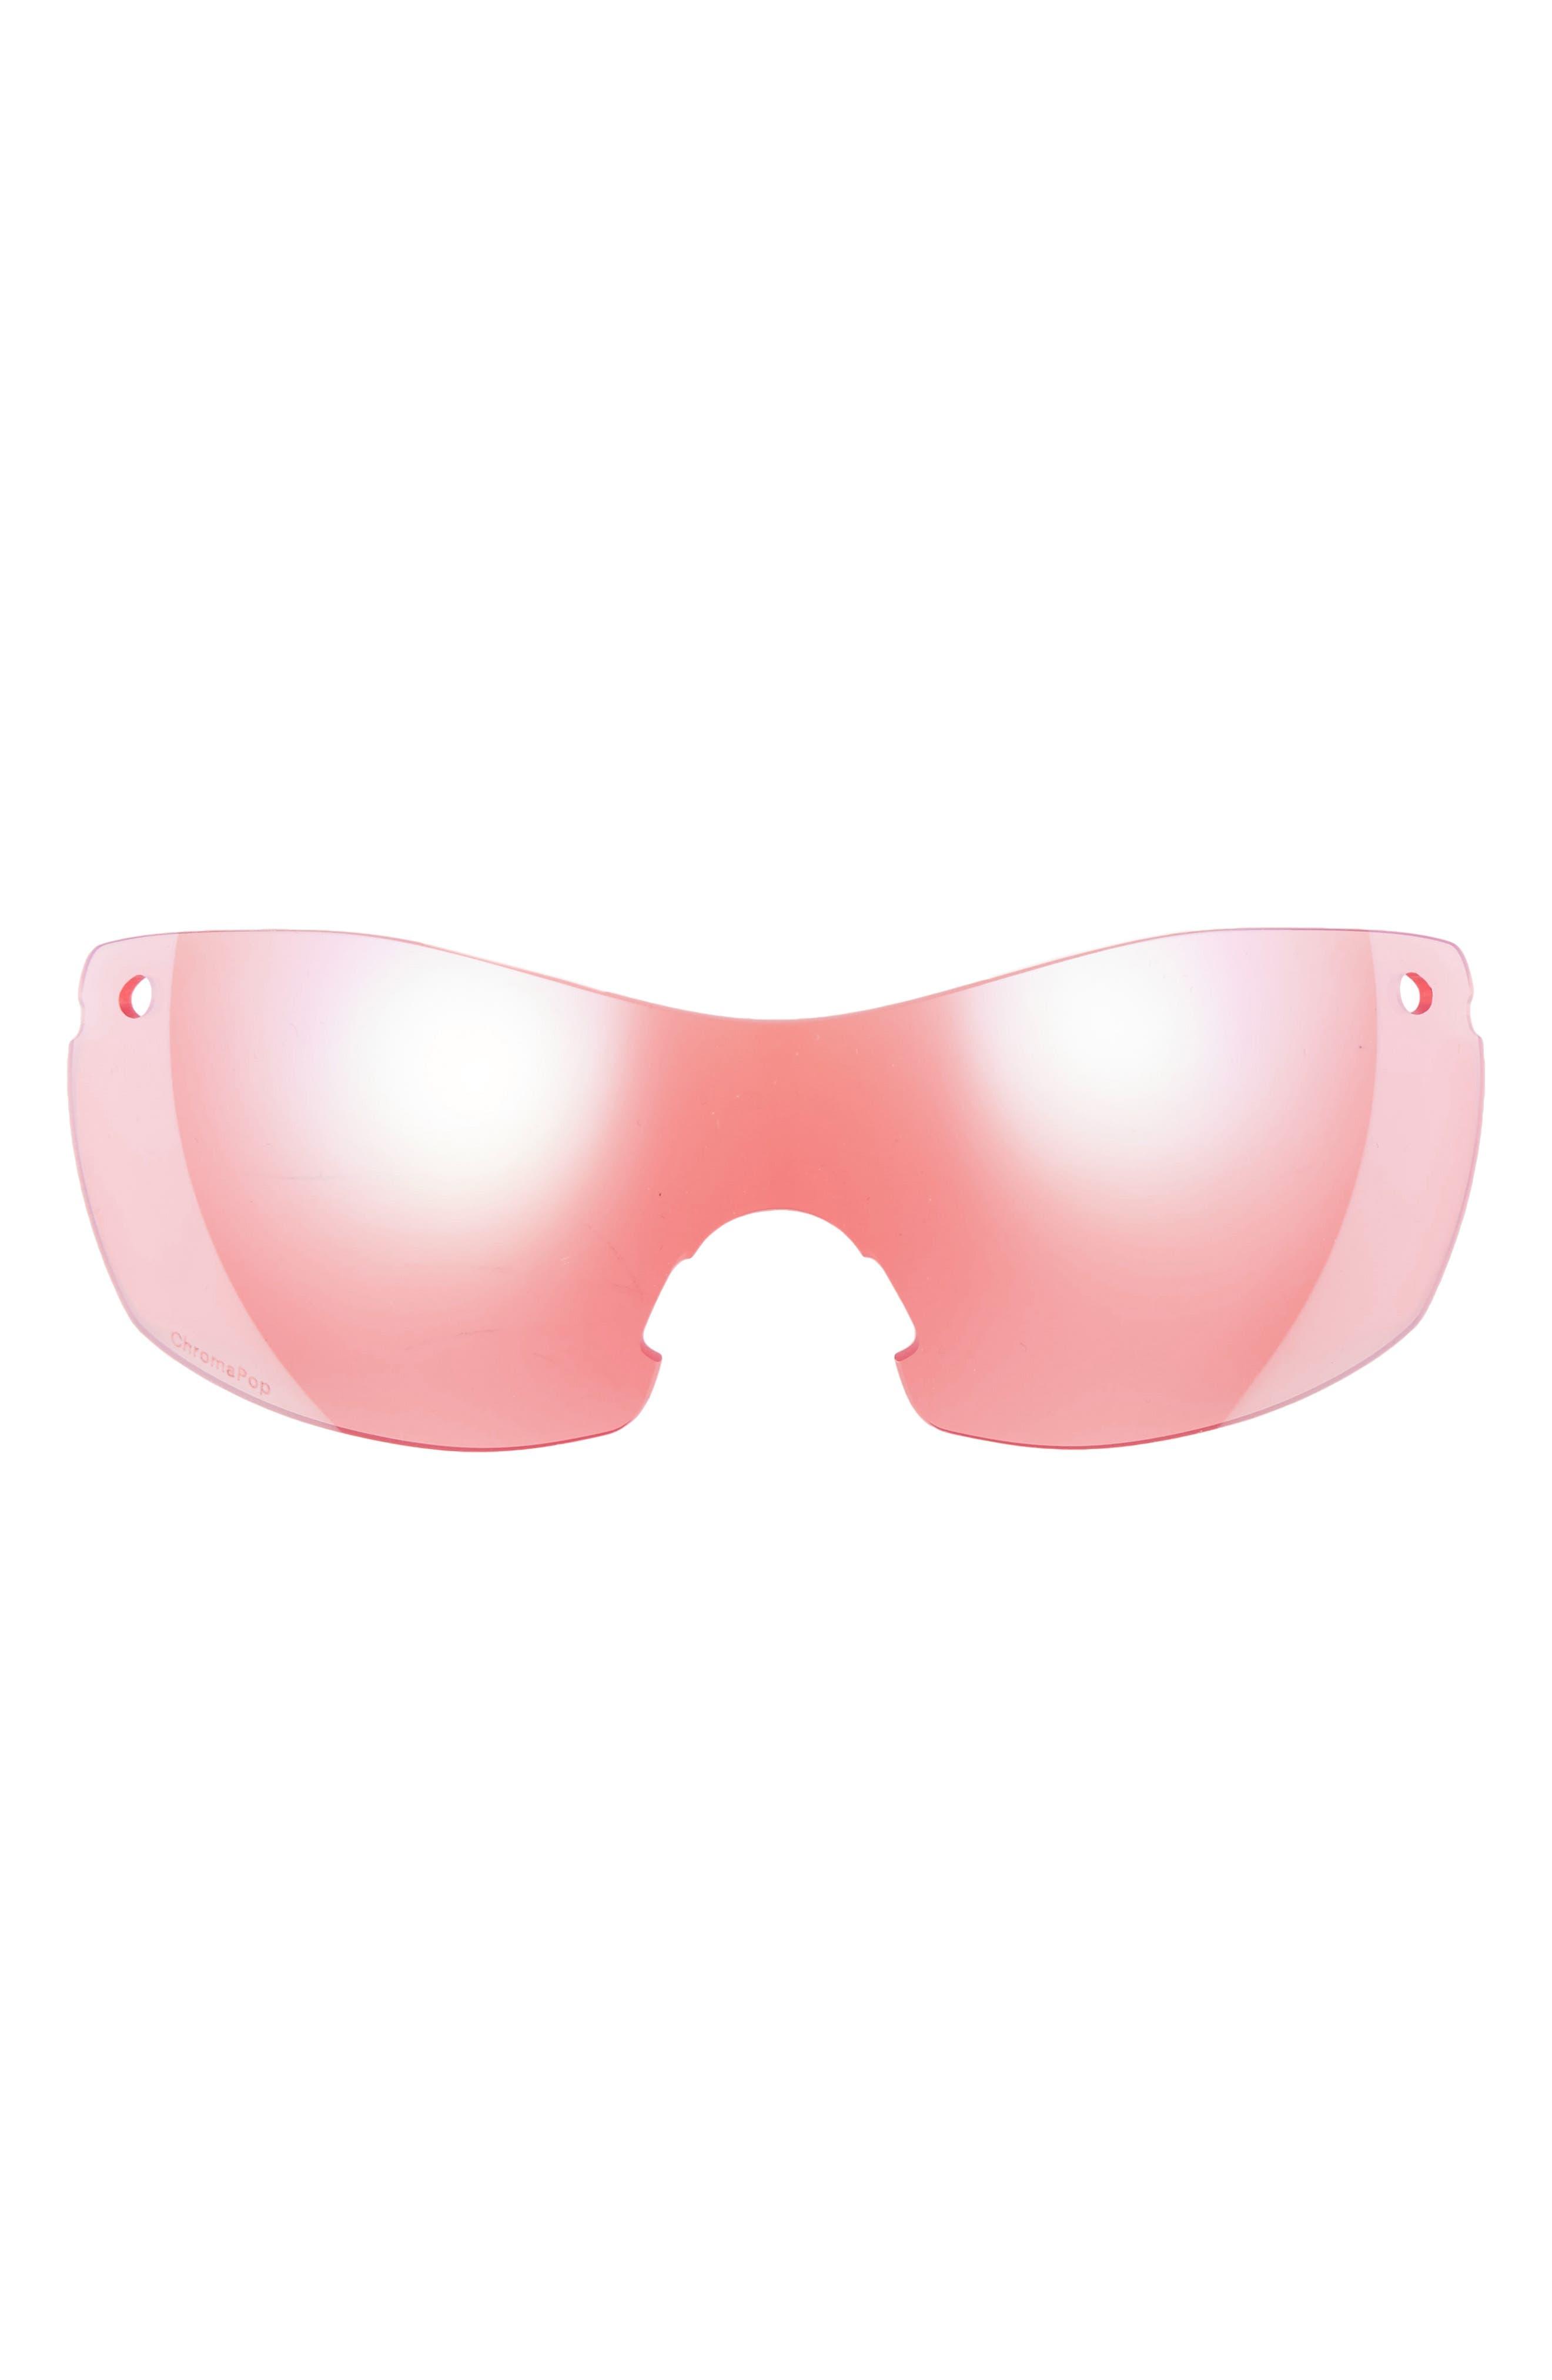 PivLock<sup>™</sup> Asana 150mm ChromaPop Polarized Sunglasses,                             Alternate thumbnail 19, color,